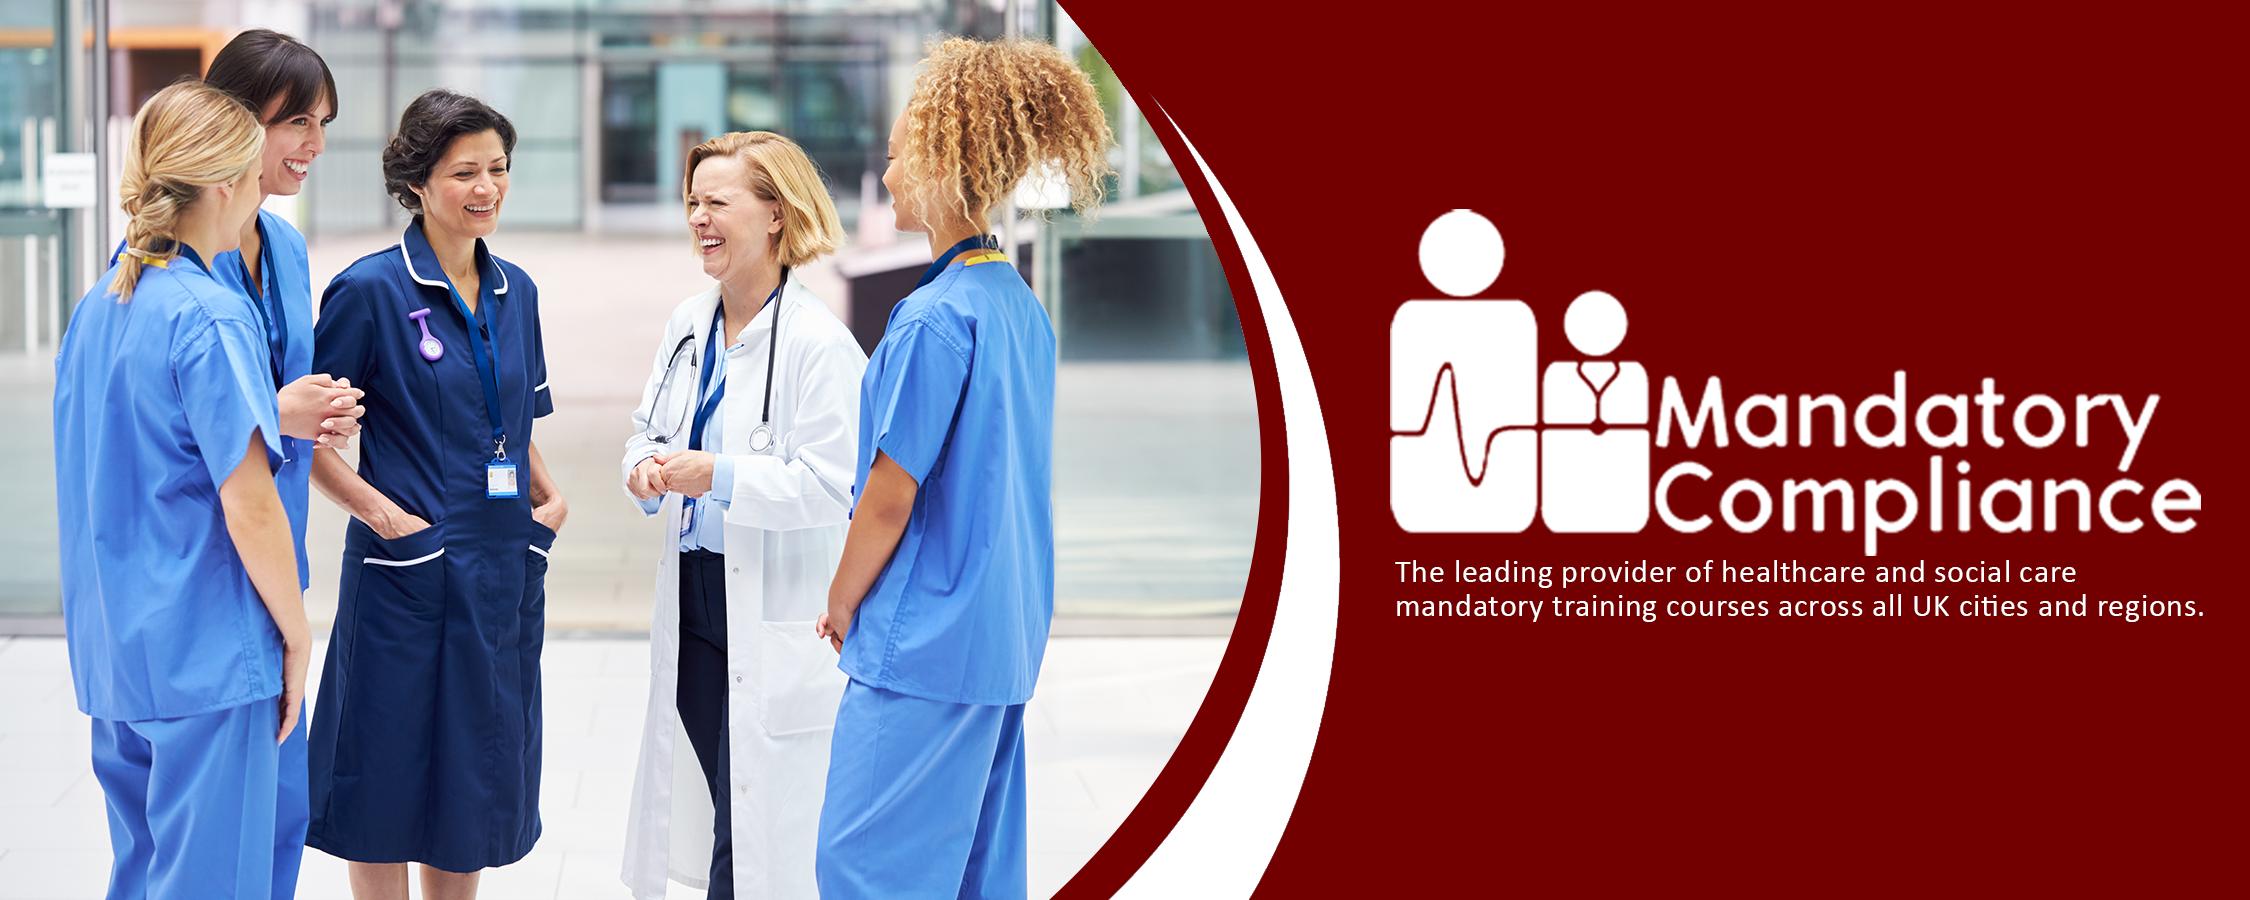 Servant Leadership Training - E-Learning Courses - Mandatory Compliance UK -